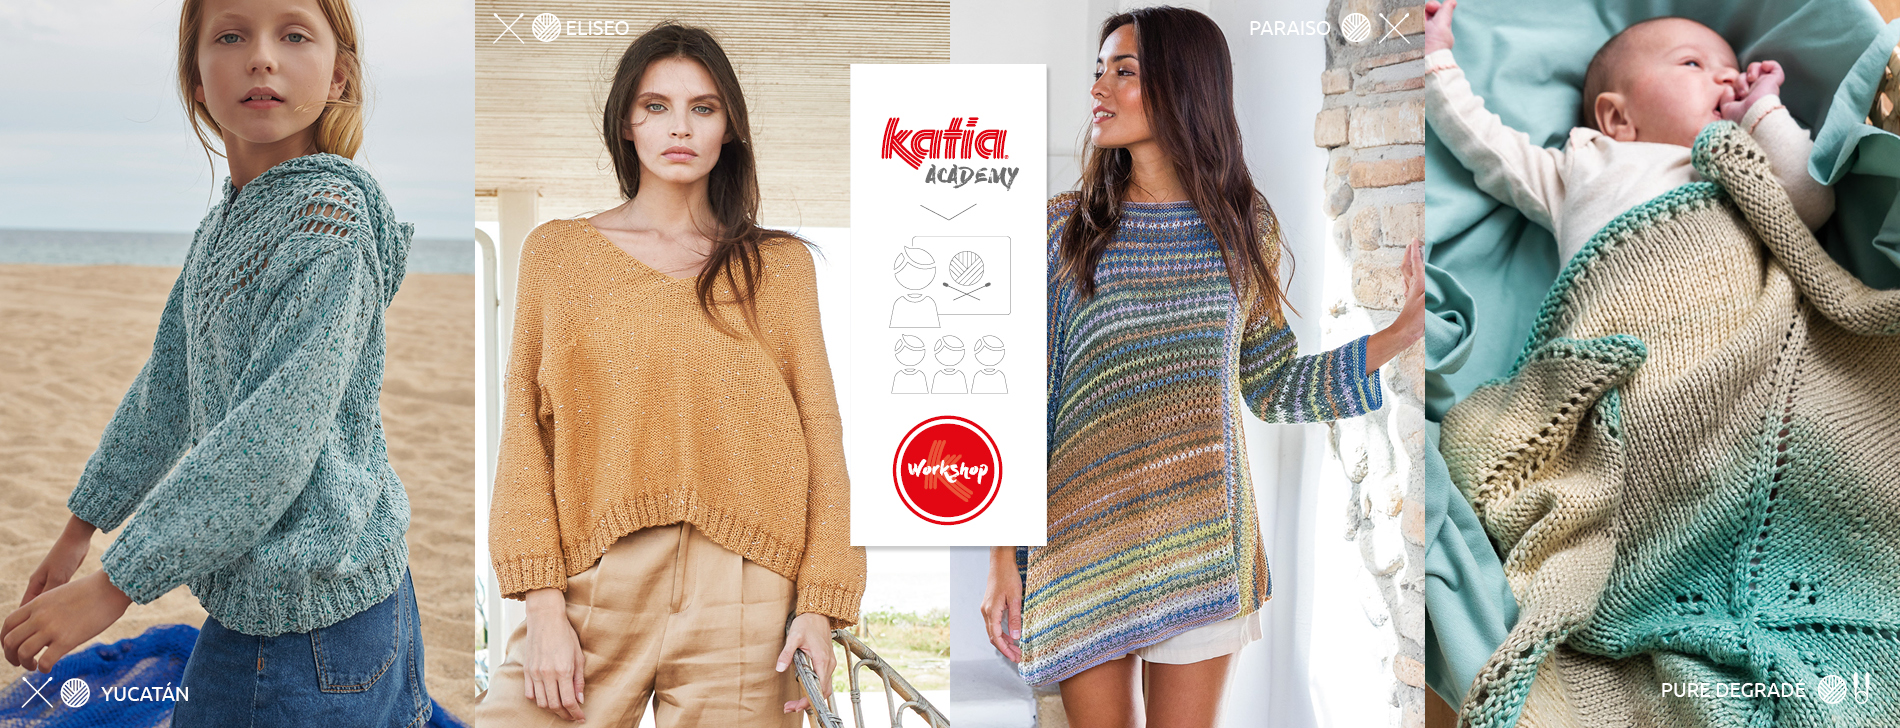 Katia Workshops